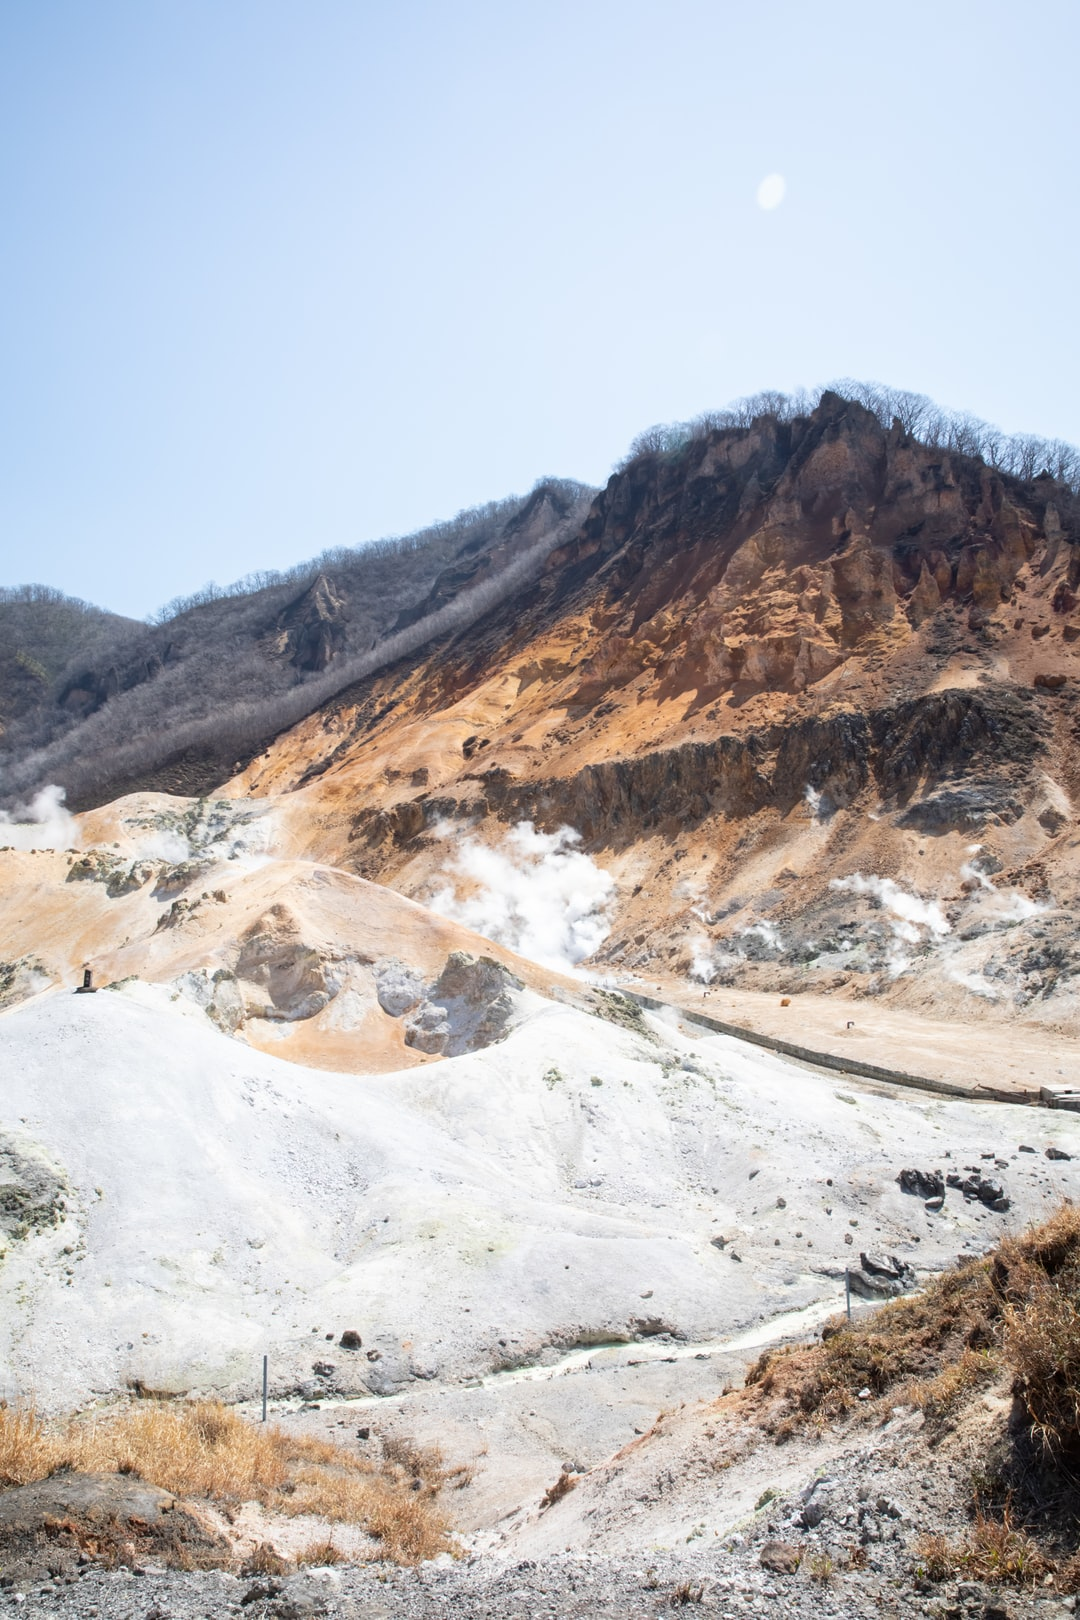 Jigokudani - hell valley - noboribetsu - volcanism hot spring - Hokkaido - Japan